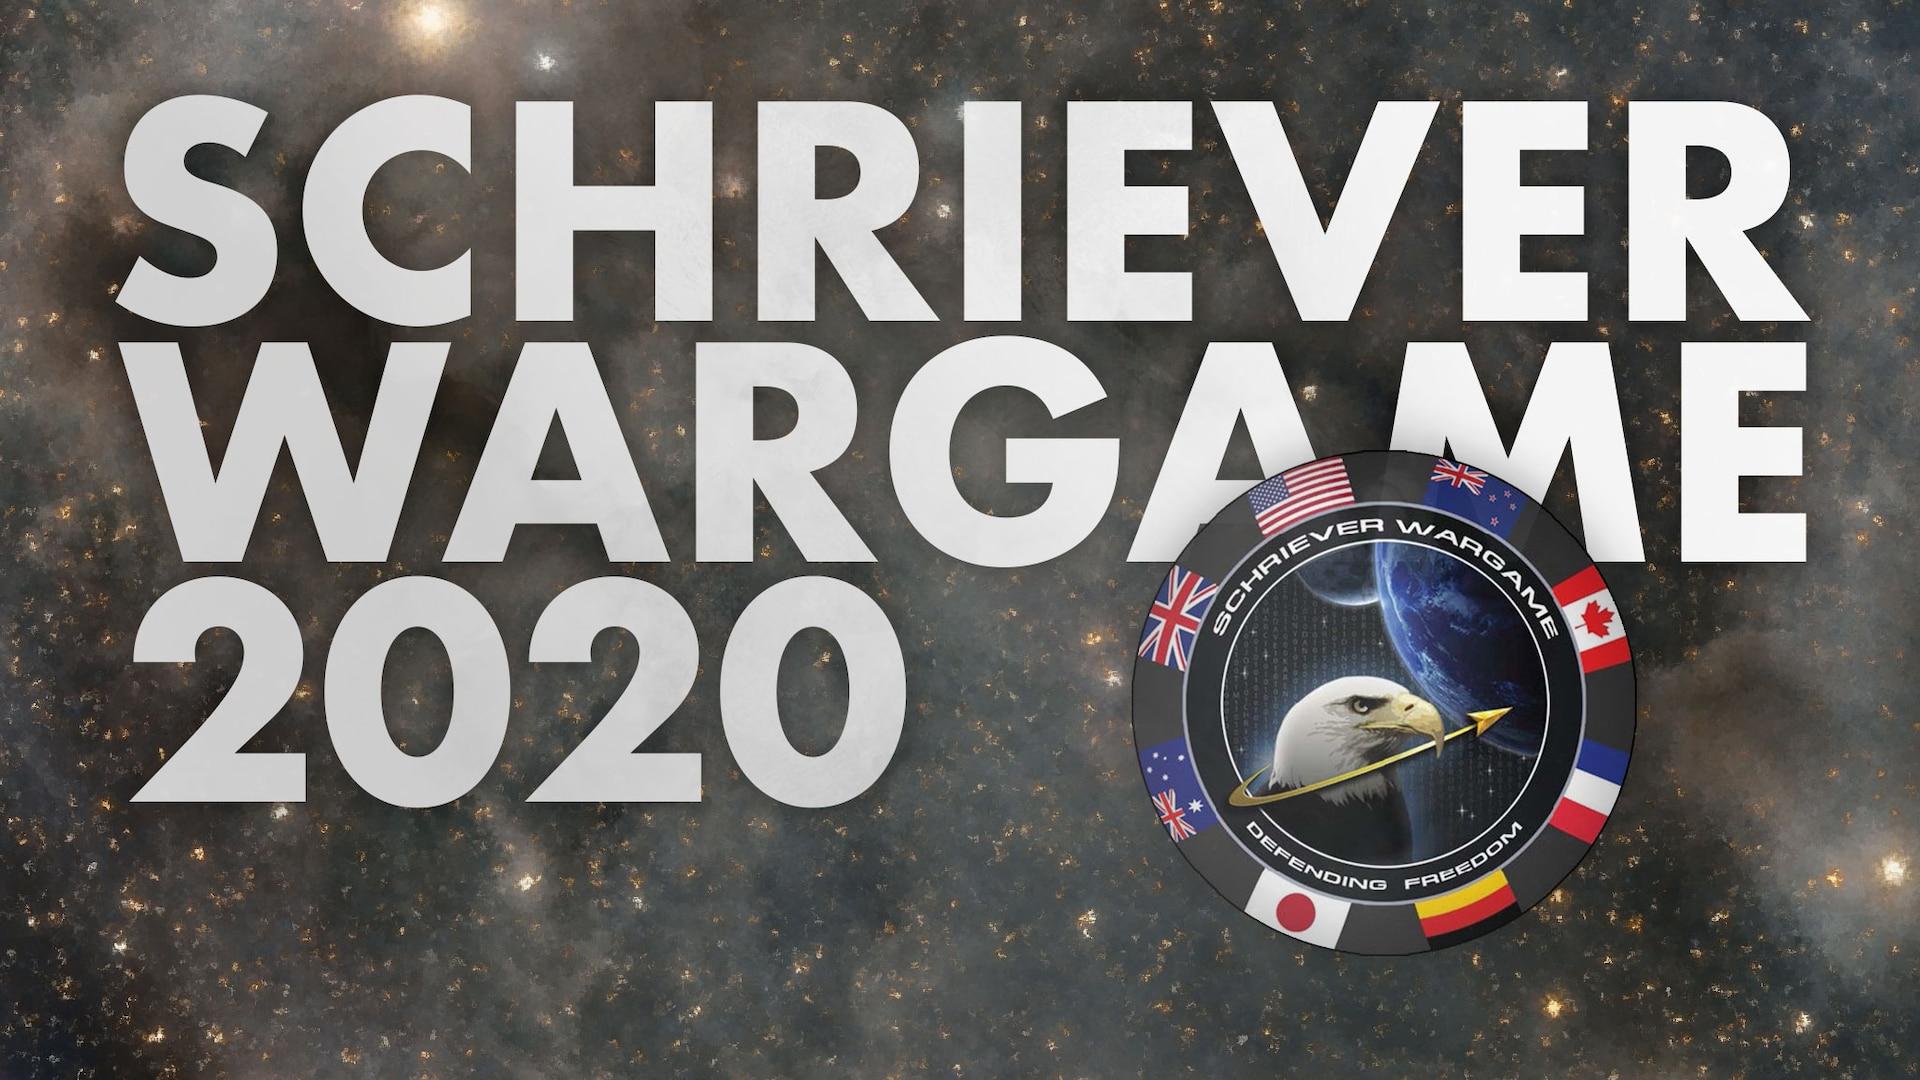 Schriever Wargame: Critical Space Event Concludes